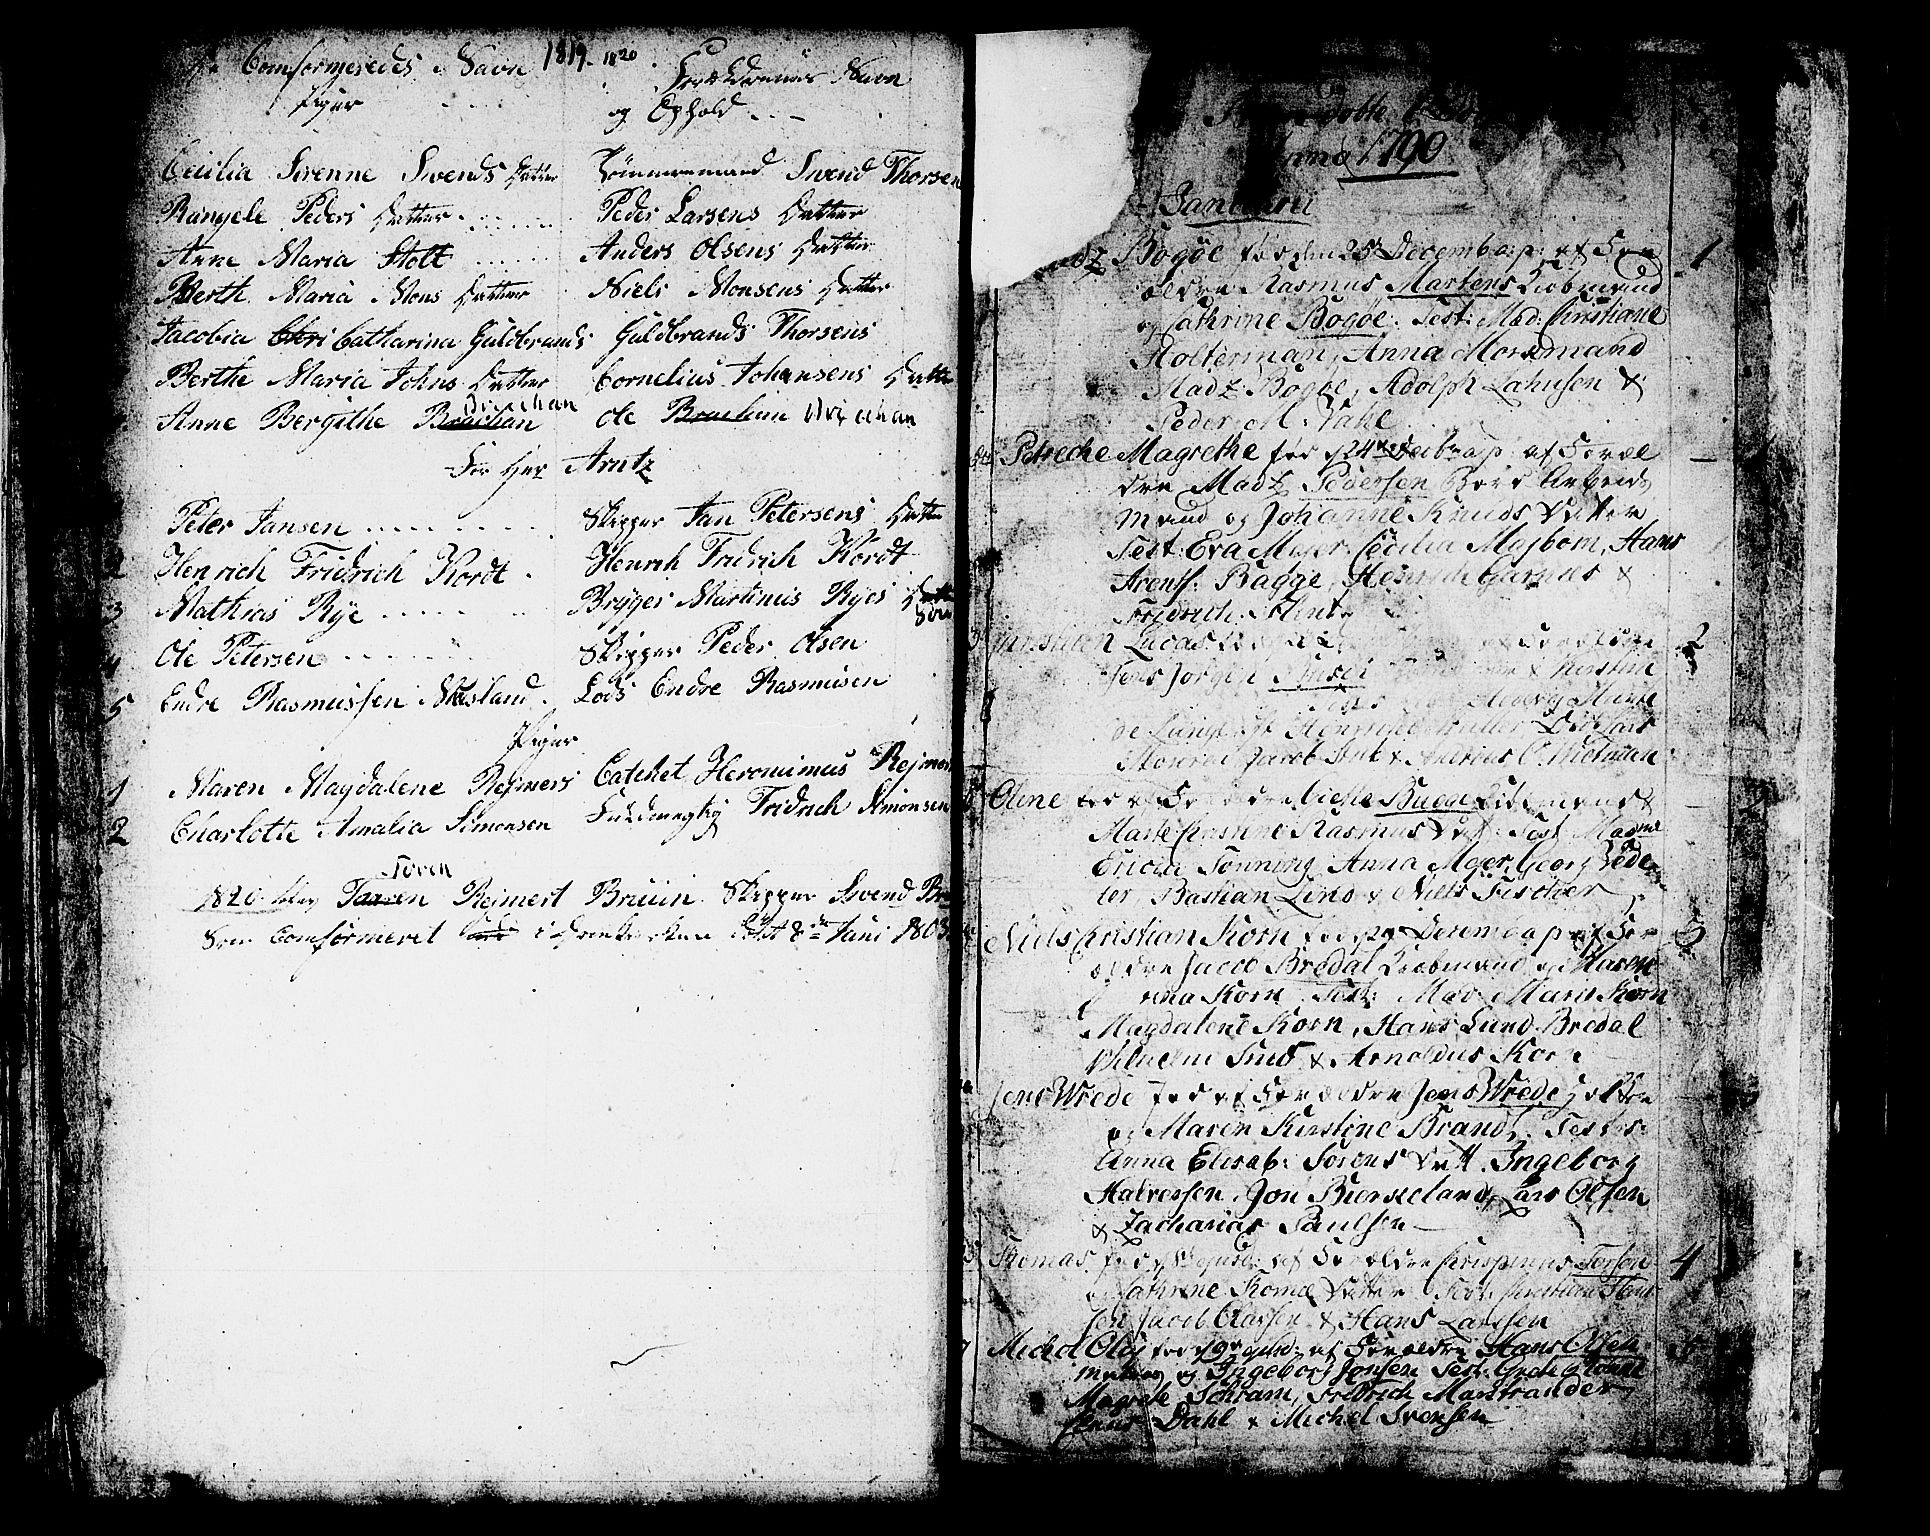 SAB, Domkirken Sokneprestembete, H/Haa/L0004: Ministerialbok nr. A 4, 1763-1820